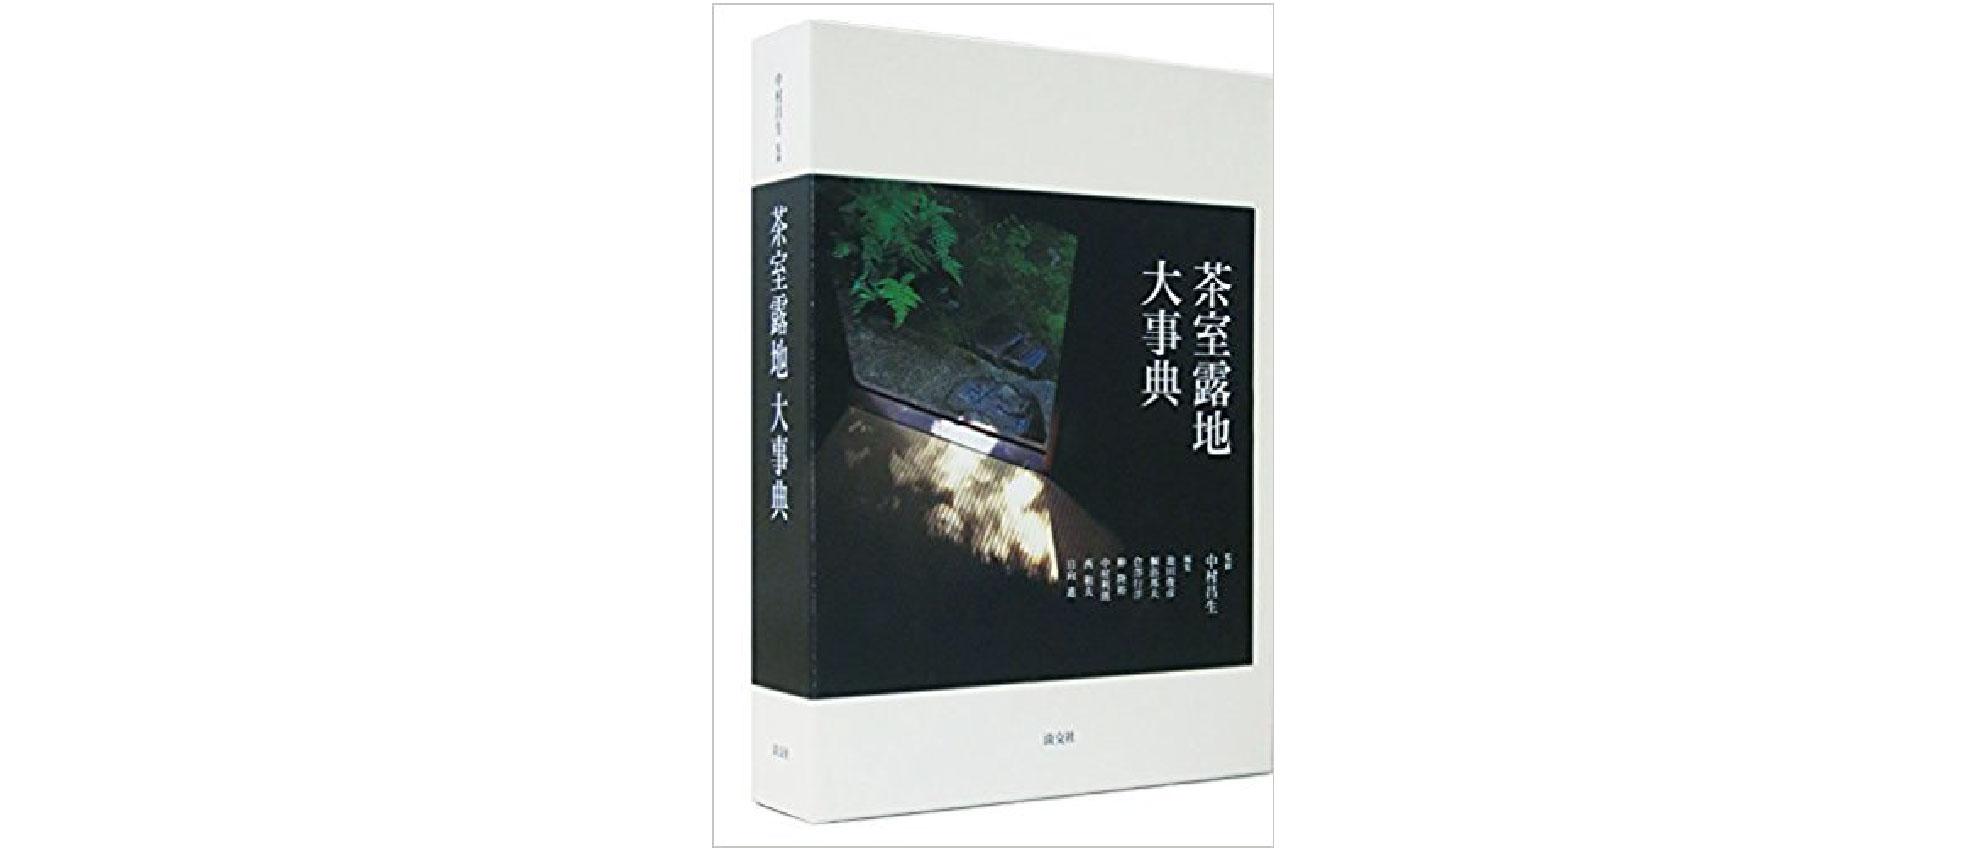 【淡交社】『茶室露地大事典』新刊のご案内